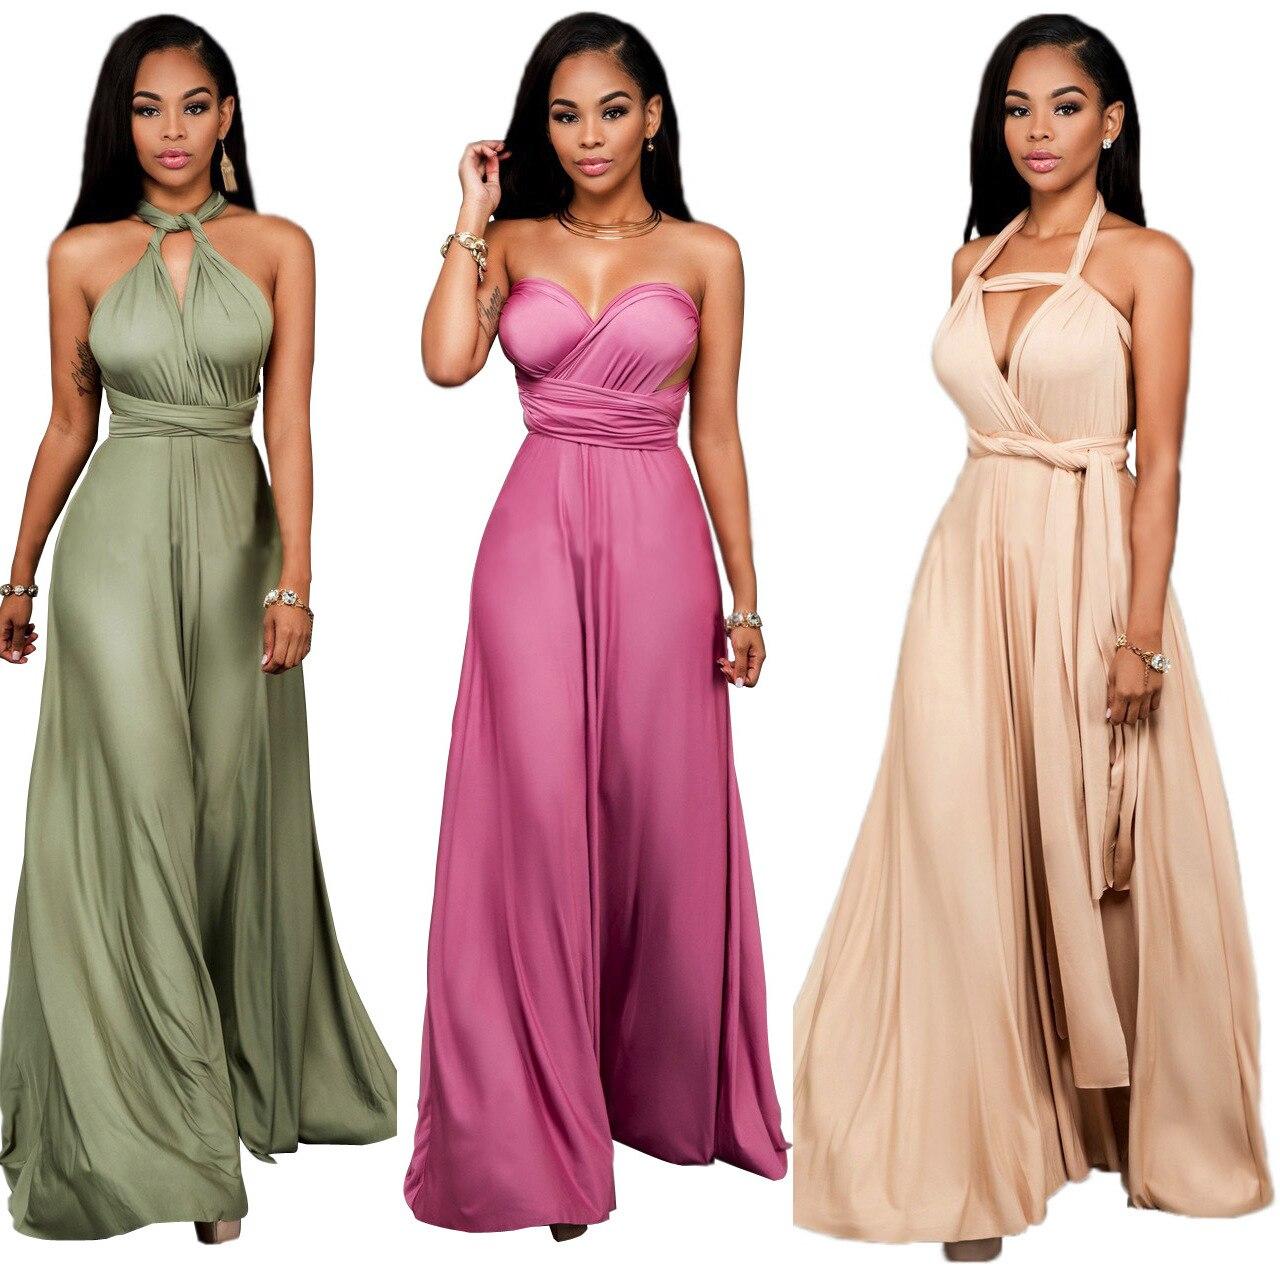 Convertible infinity bridesmaid wrap dress size 2x fashion dresses convertible infinity bridesmaid wrap dress size 2x ombrellifo Gallery